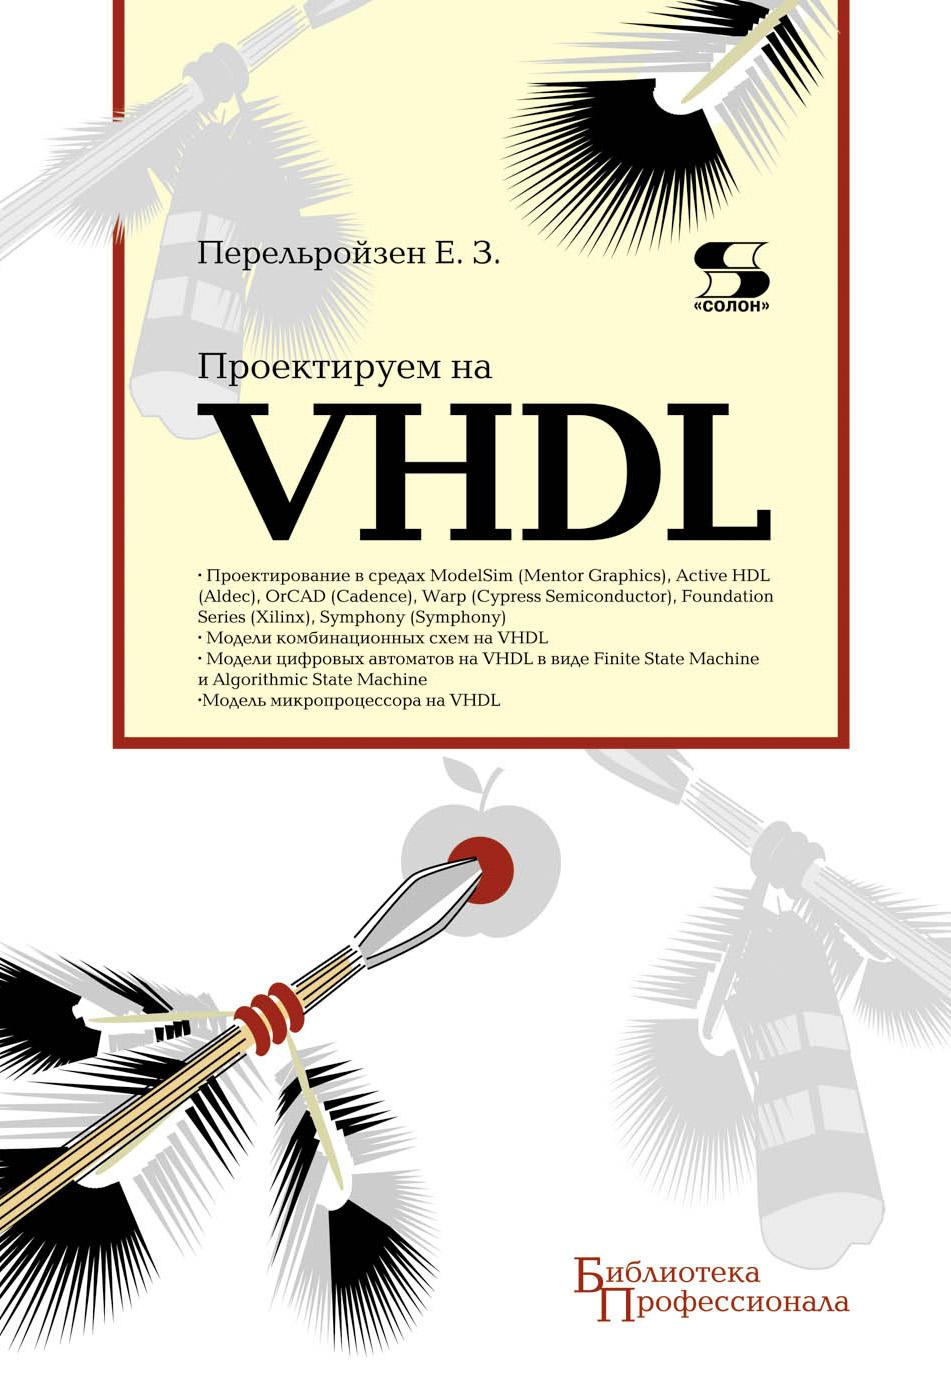 Проектируем на VHDL